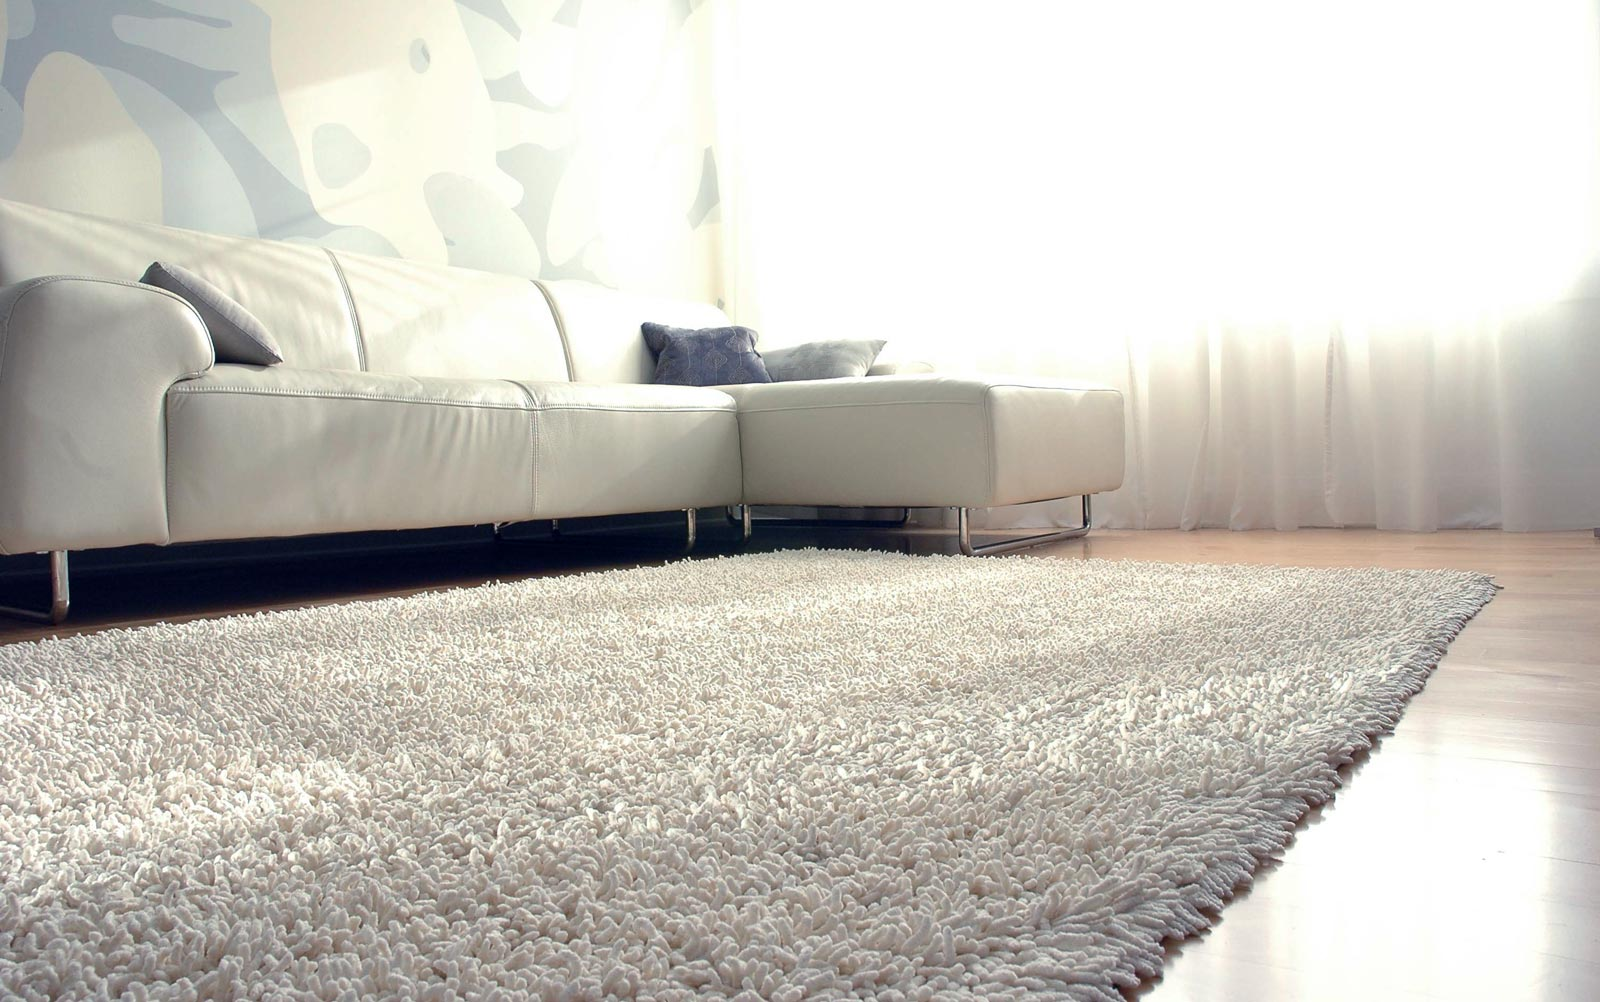 Din ce material ar trebui sa fie confectionat covorul Covoare naturale sau artificiale lana, iuta sisal sau nylon